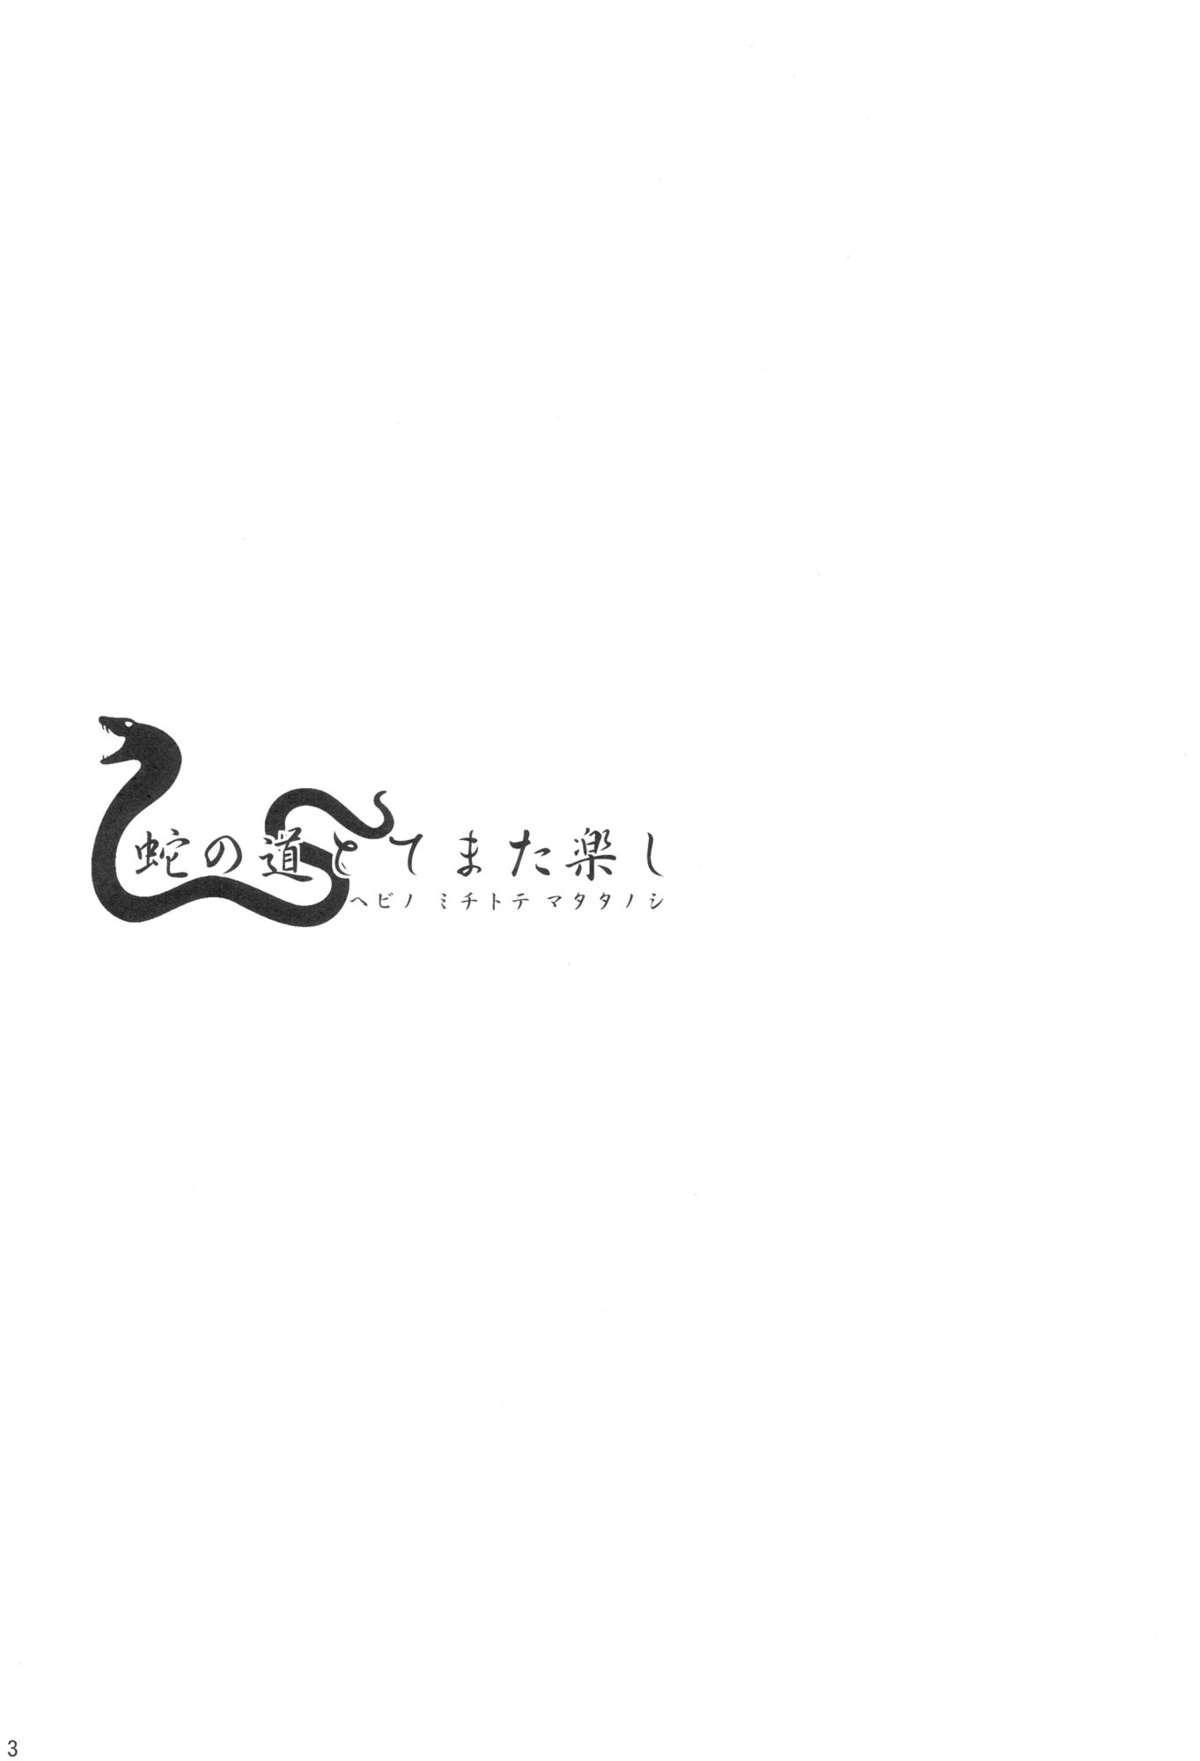 Hebi no Michi Tote Mata Tanoshi | The Trail of The Serpent is Pleasurable 1